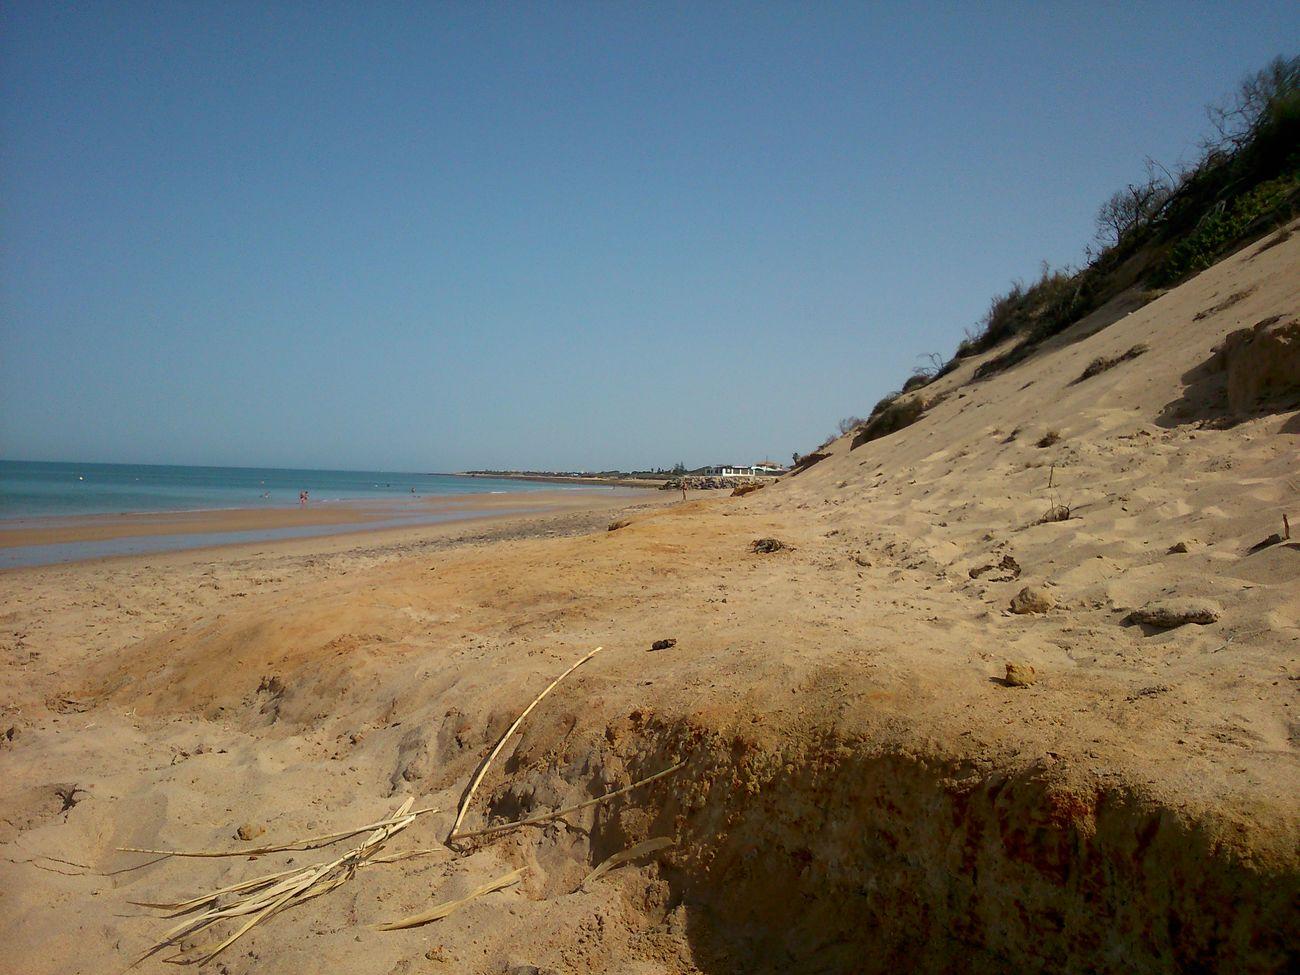 Playa De Punta Candor Taking Photos